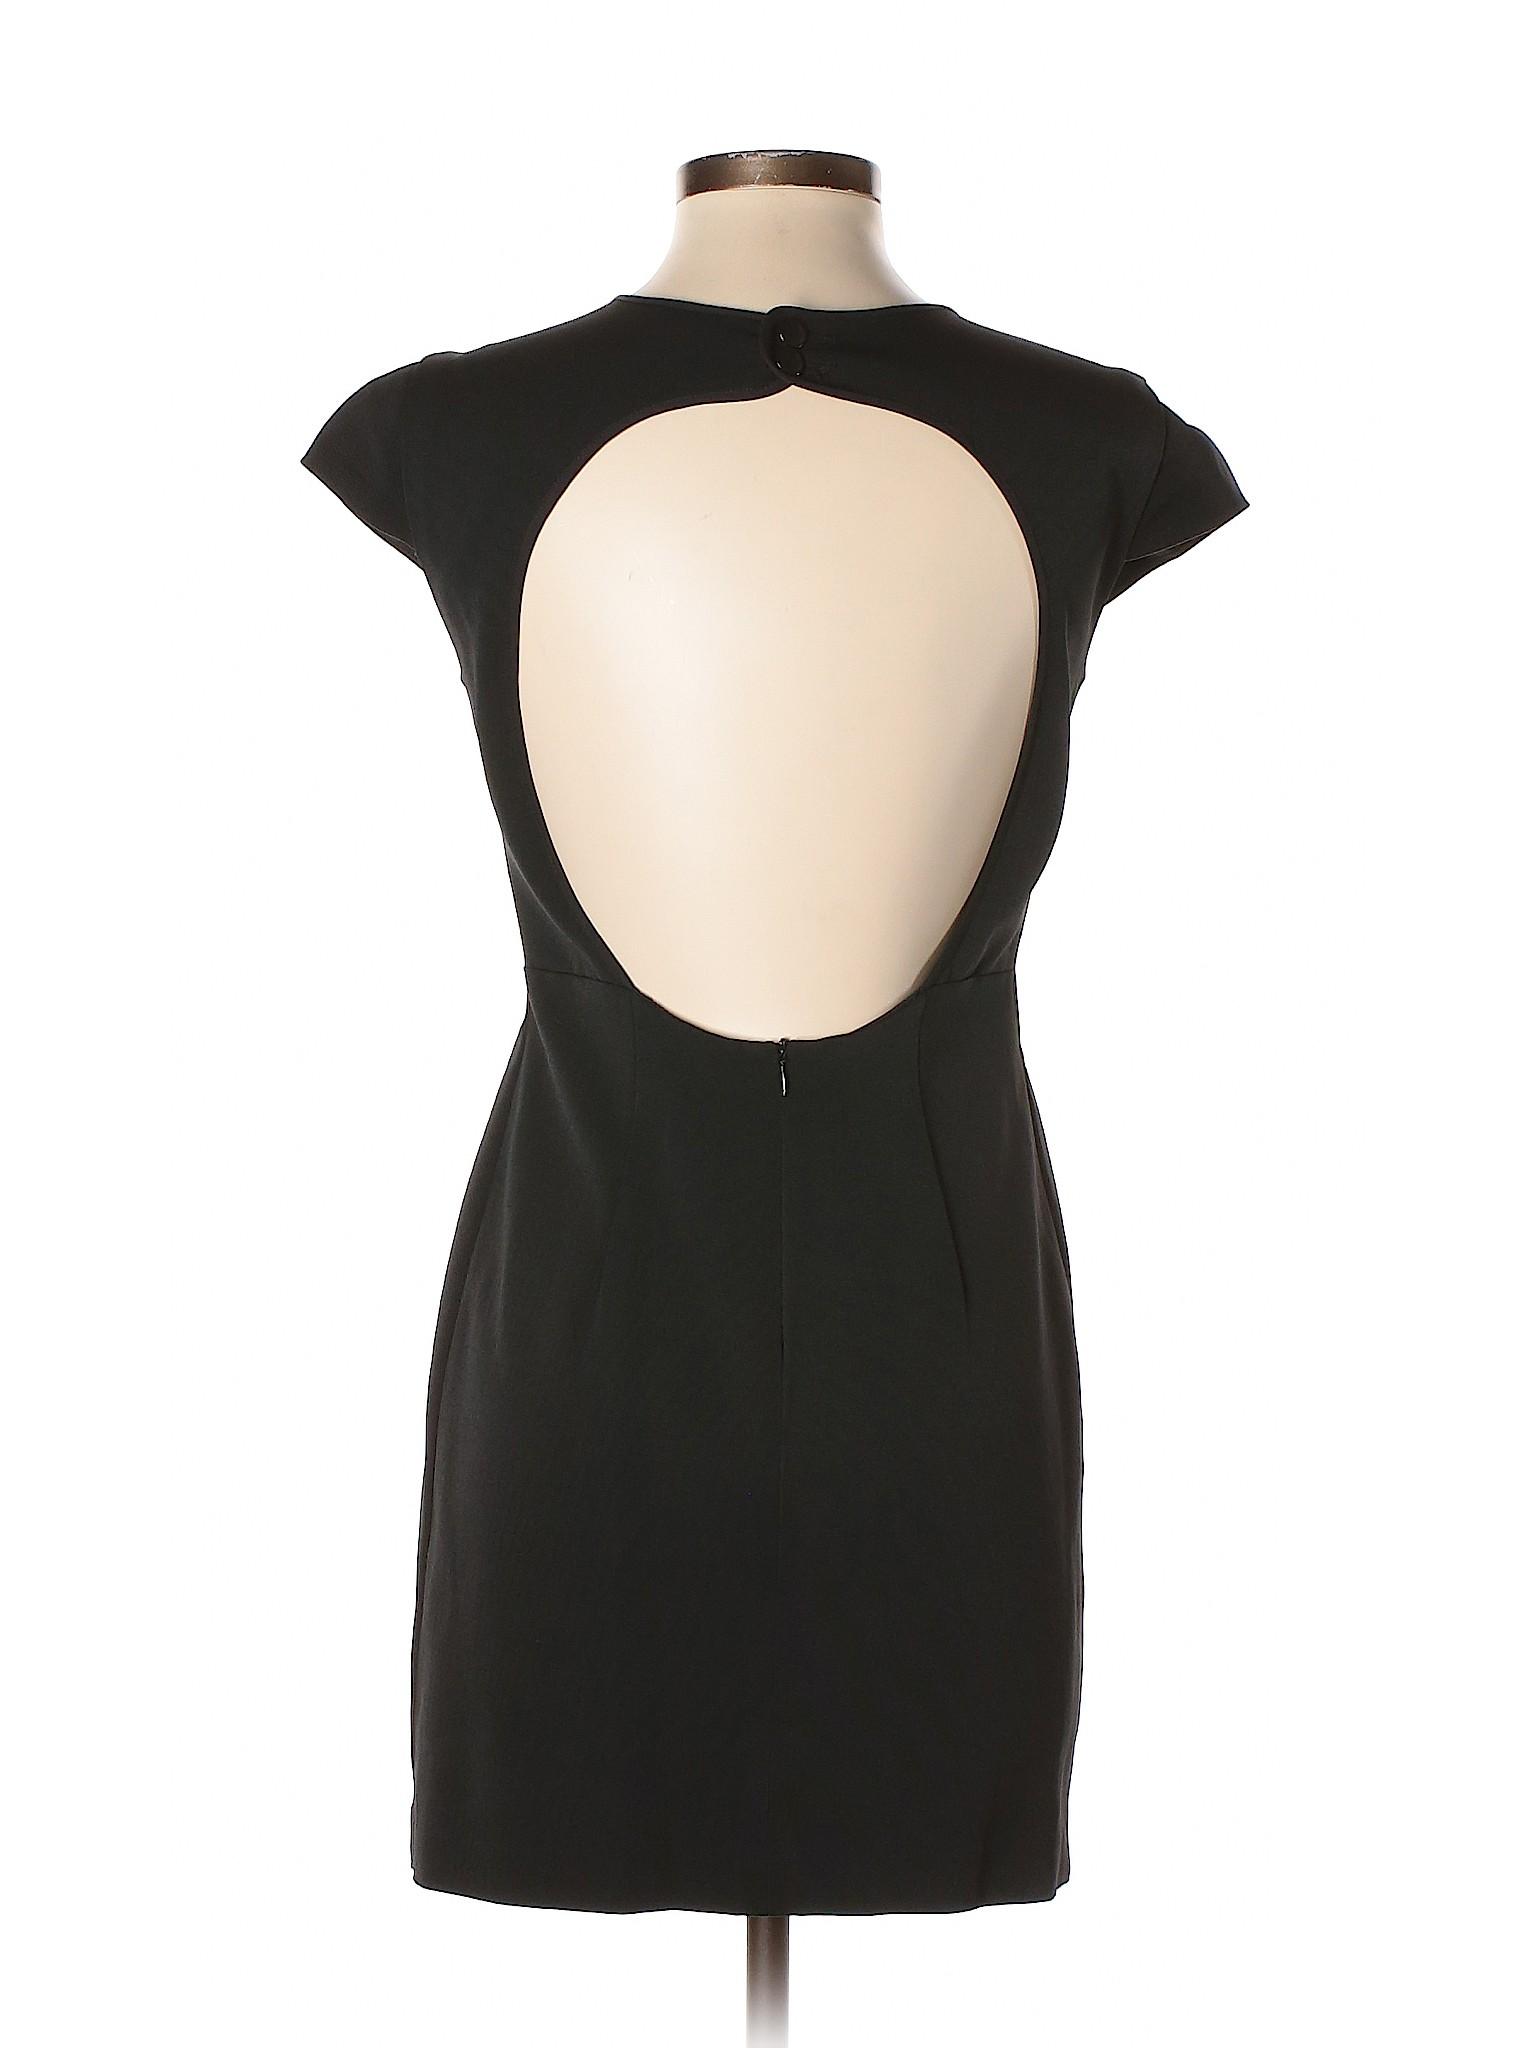 Bone Cocktail Rag amp; Dress Selling wqPYSWE